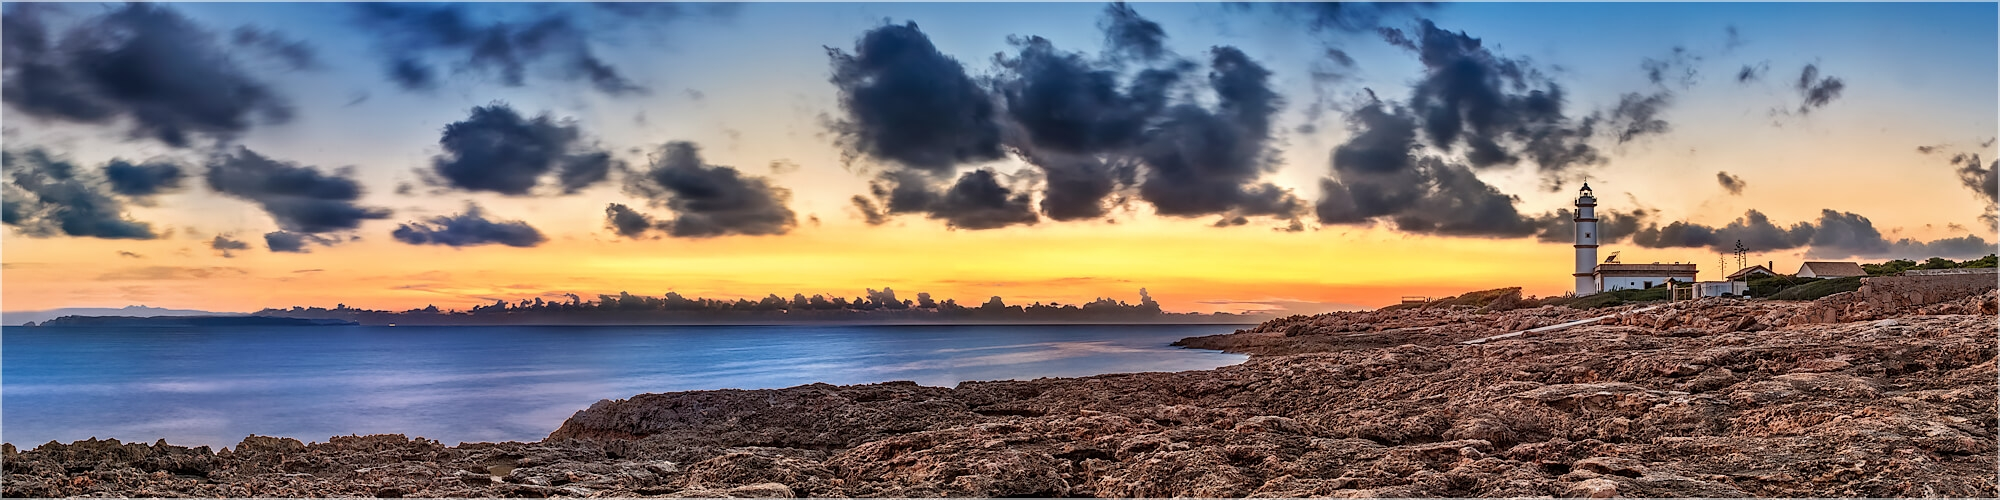 Panoramabild Sonnenuntergang über Ses Salinas Mallorca